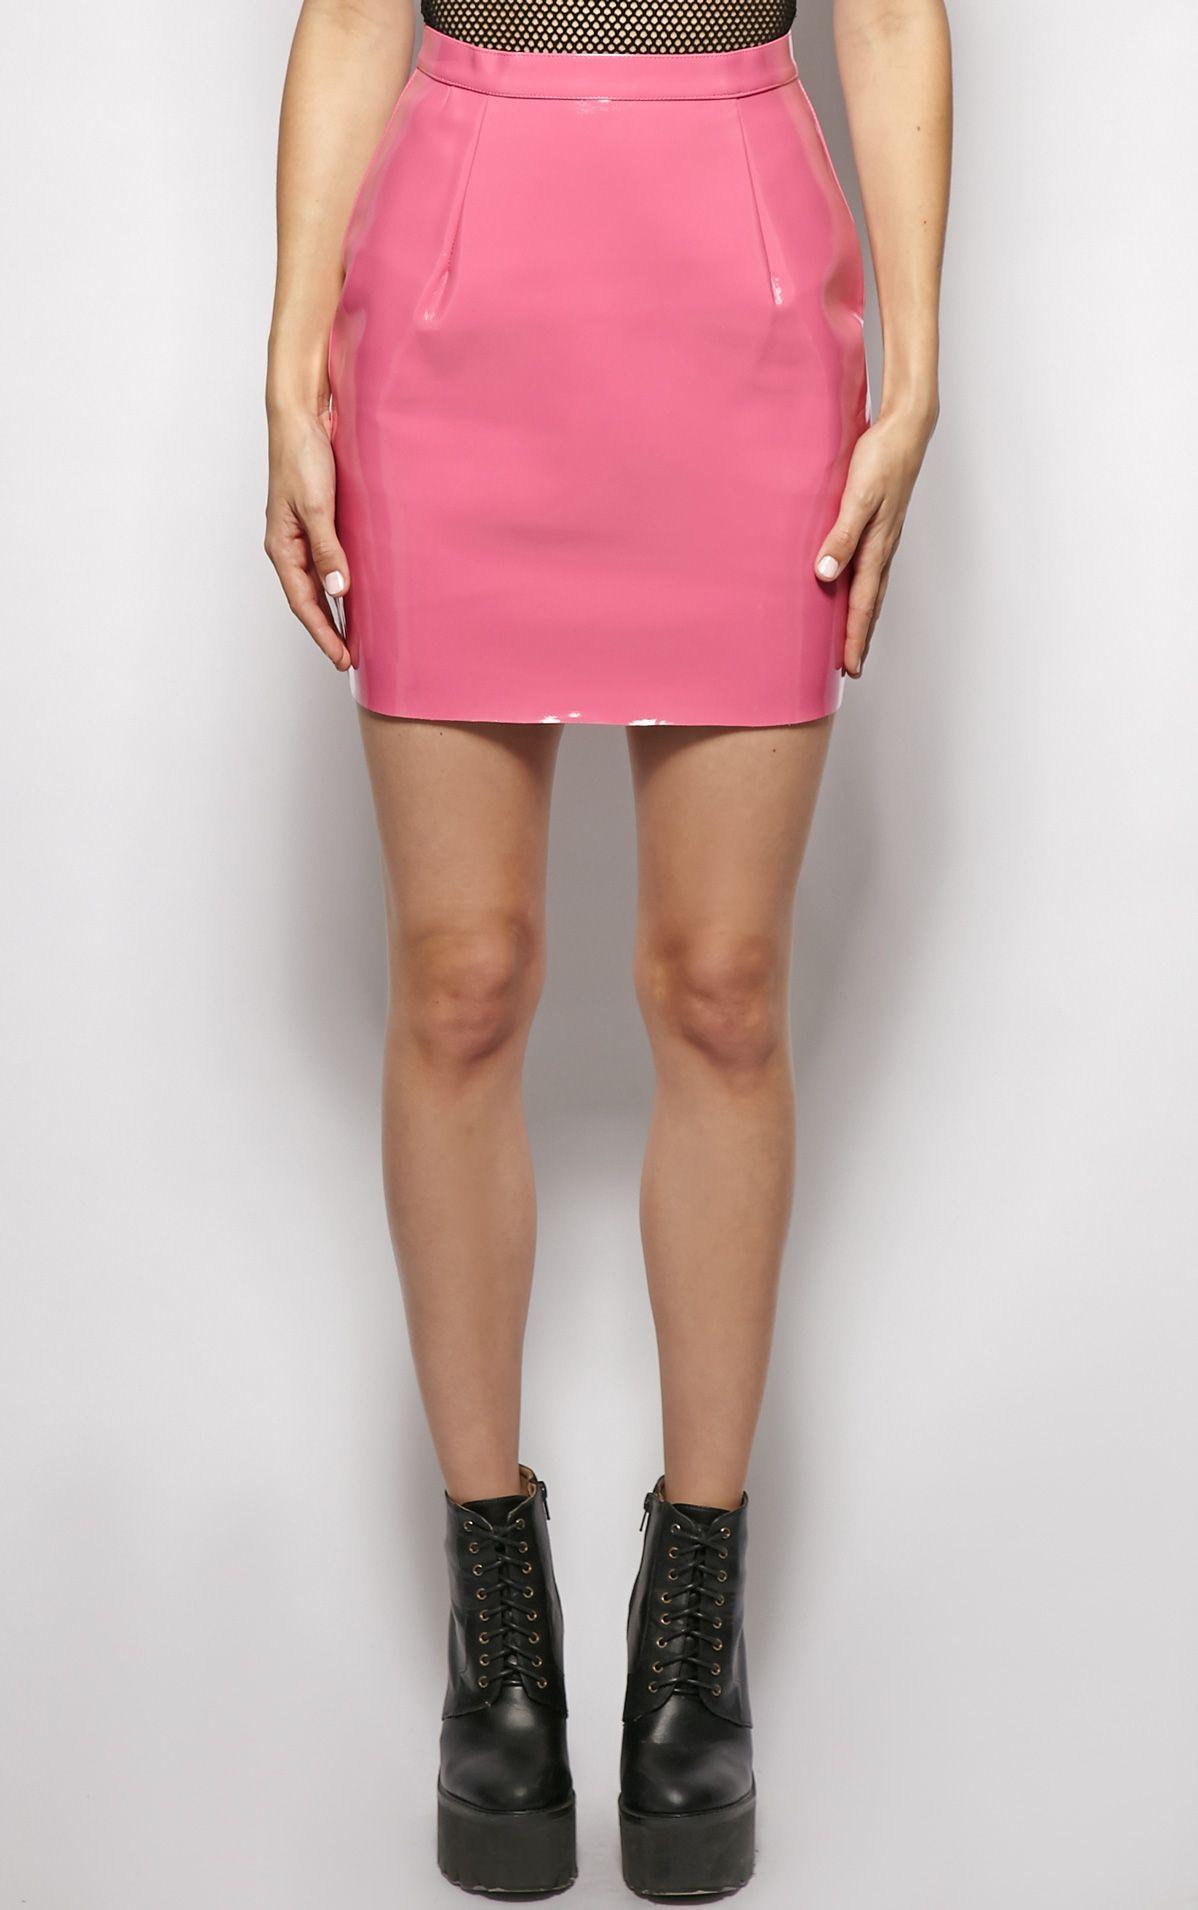 Natalya Pink Pvc Mini Skirt